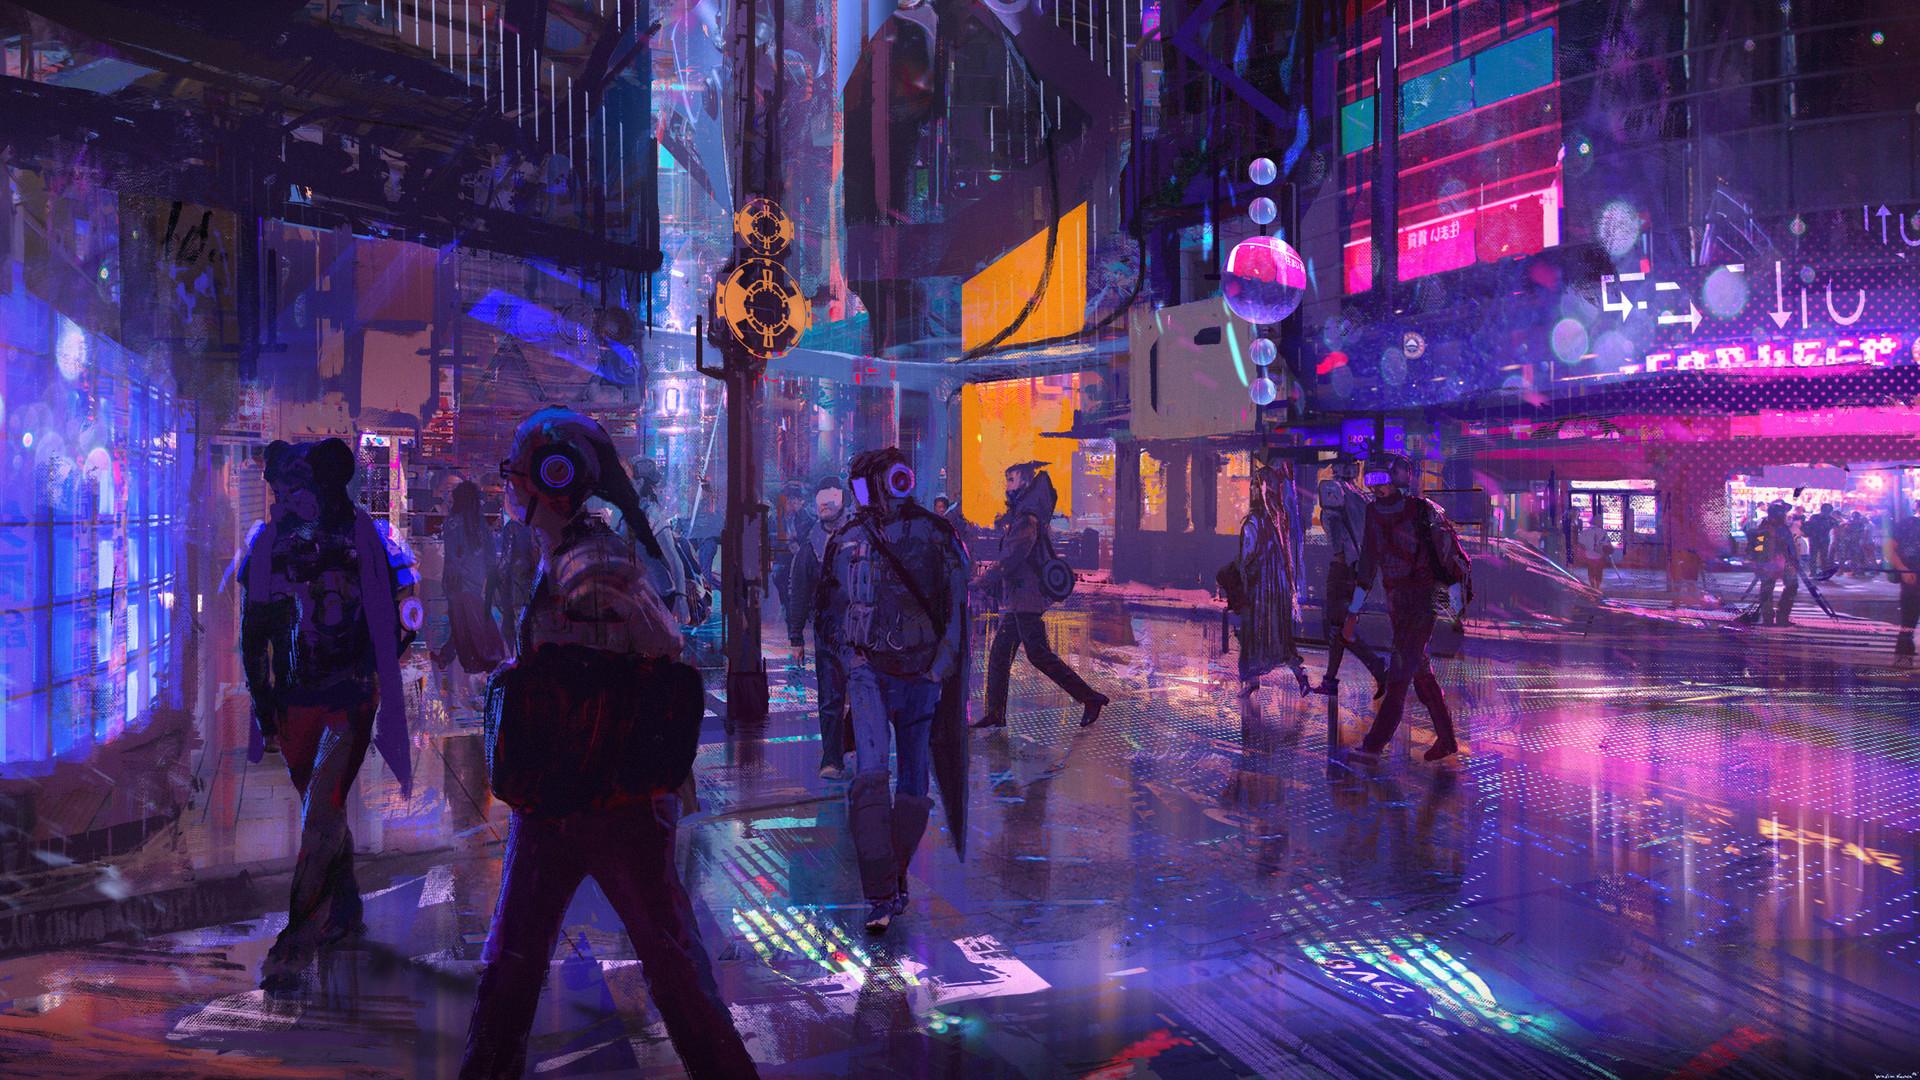 Nice wallpapers Cyberpunk 1920x1080px